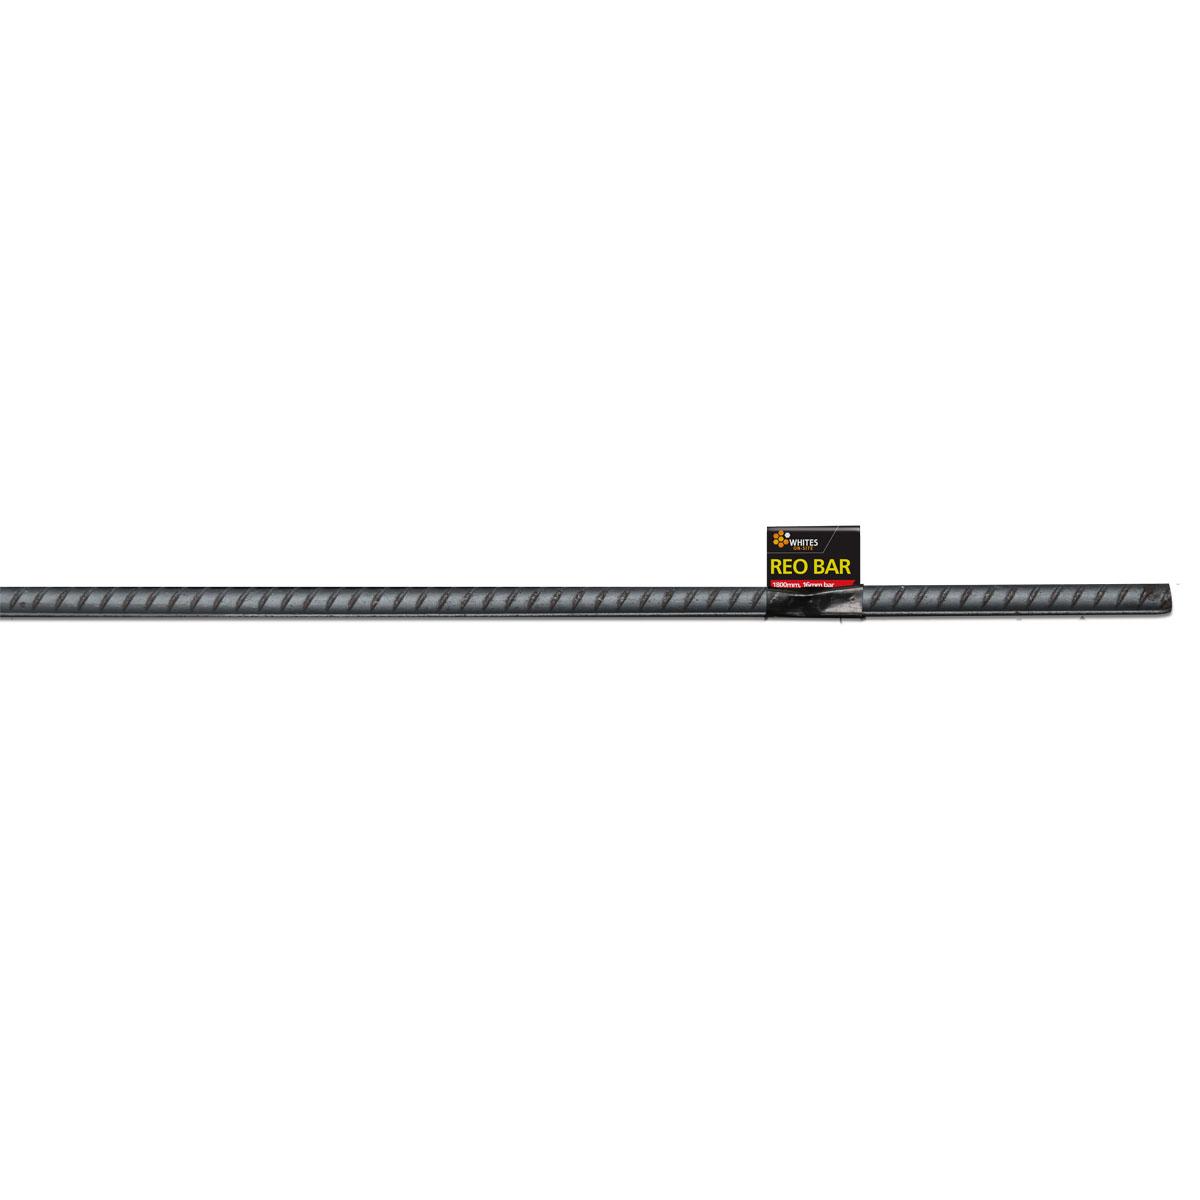 71675 - reo bars 1800mm - 16mm